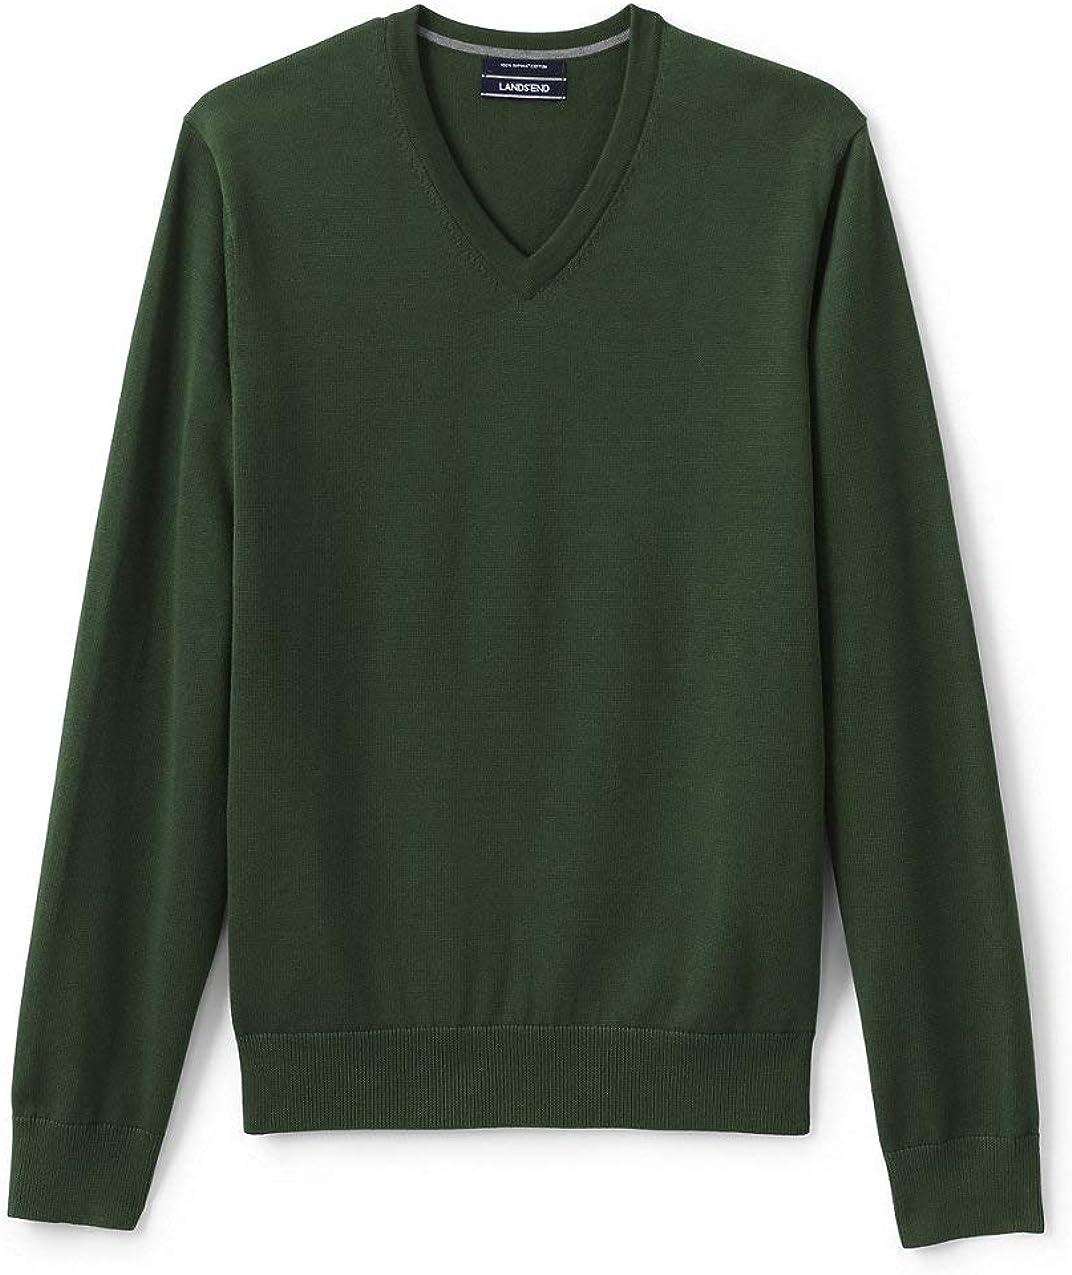 Lands End Mens Classic Fit Fine Gauge Supima Cotton V-Neck Sweater